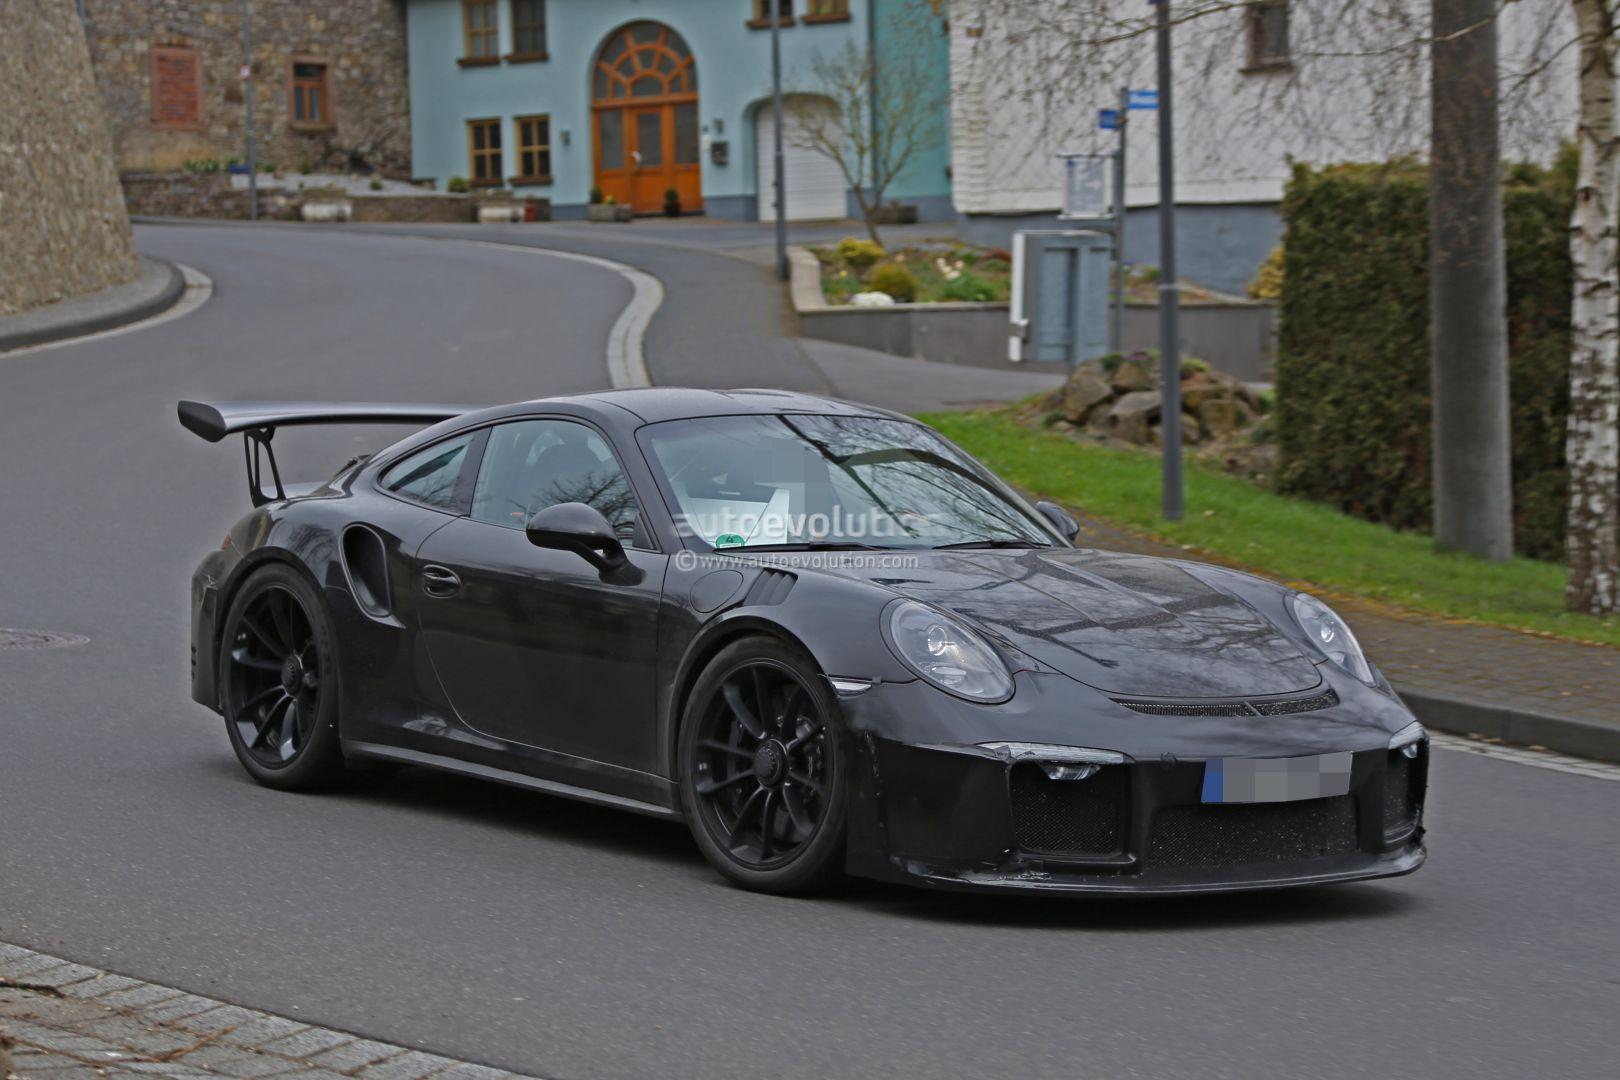 2018 Porsche 911 GT3 RS Spied, Has 4.2L Engine, 911 R-like ...